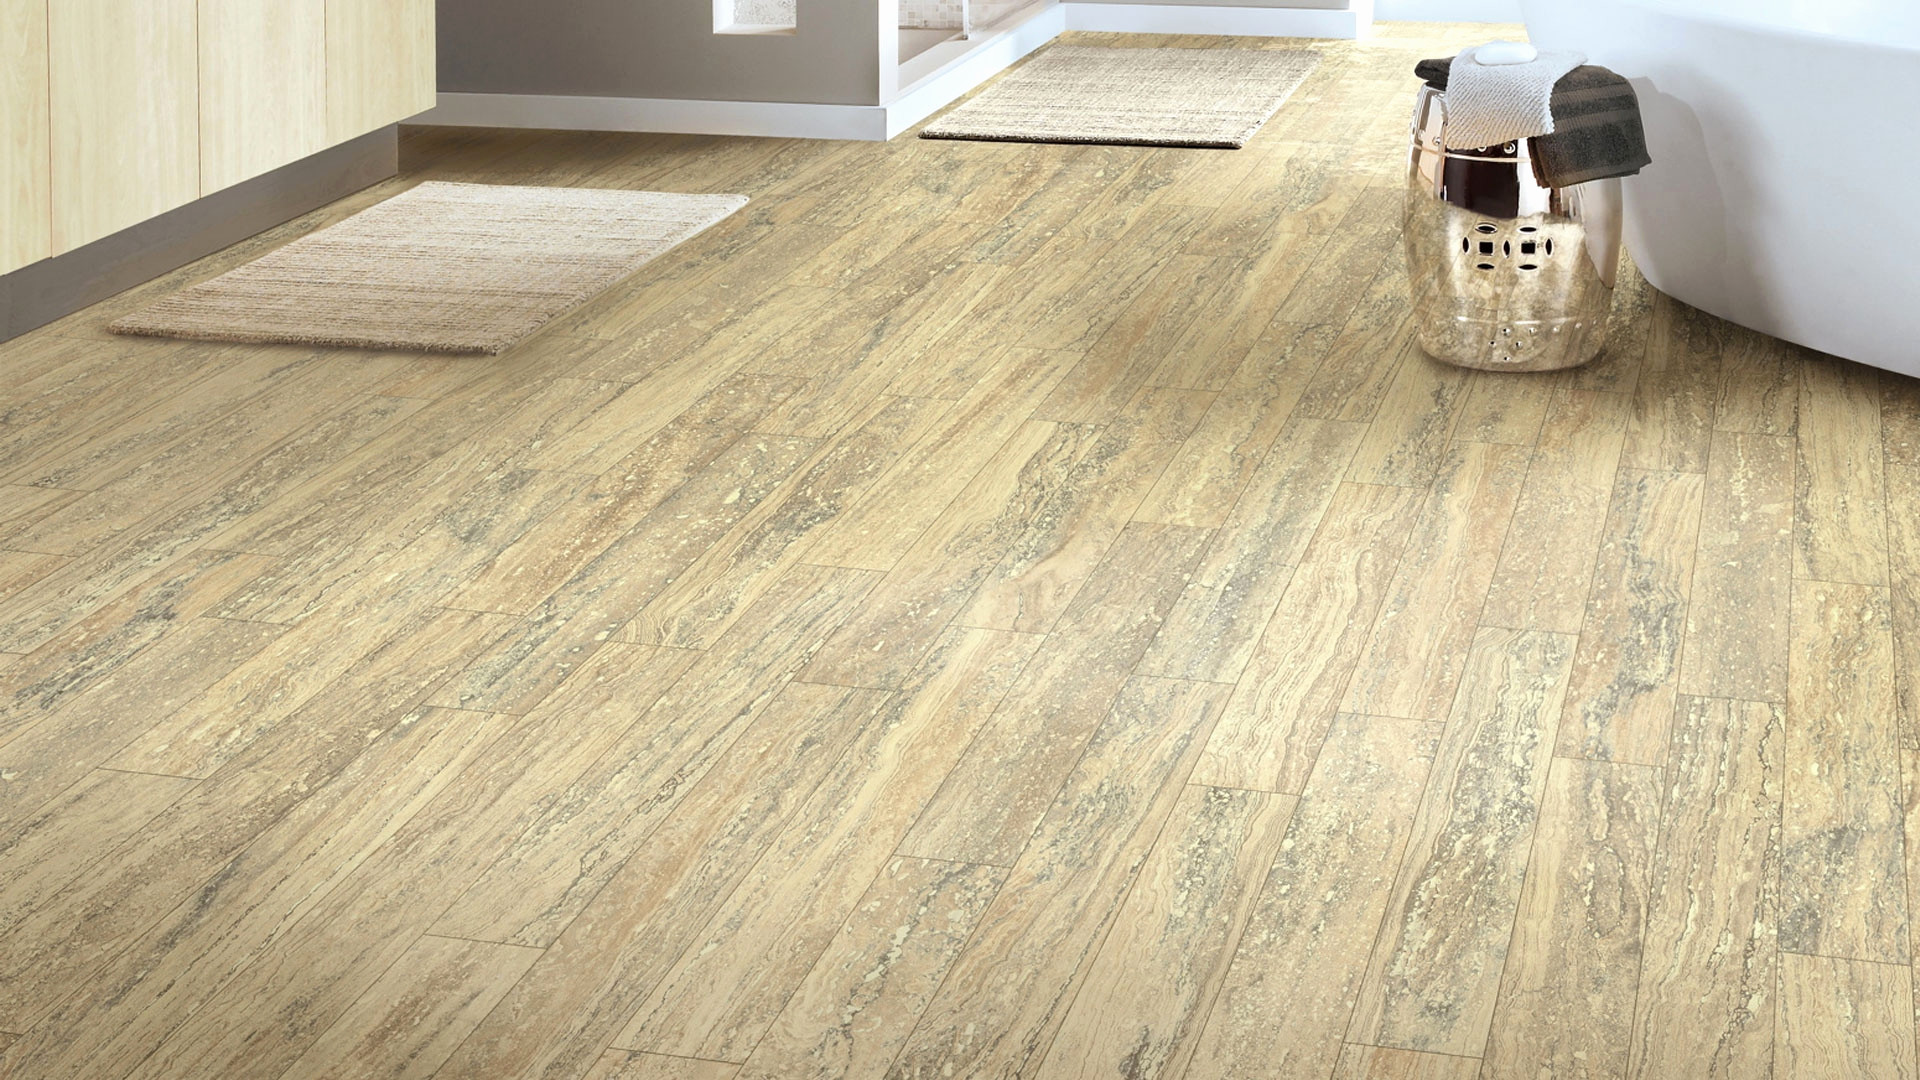 Hardwood Floor Installation Estimate Of Pretty Bathroom Wood Floor or Wood Flooring Cost Ngajari Com Intended for Pretty Bathroom Wood Floor or Wood Flooring Cost